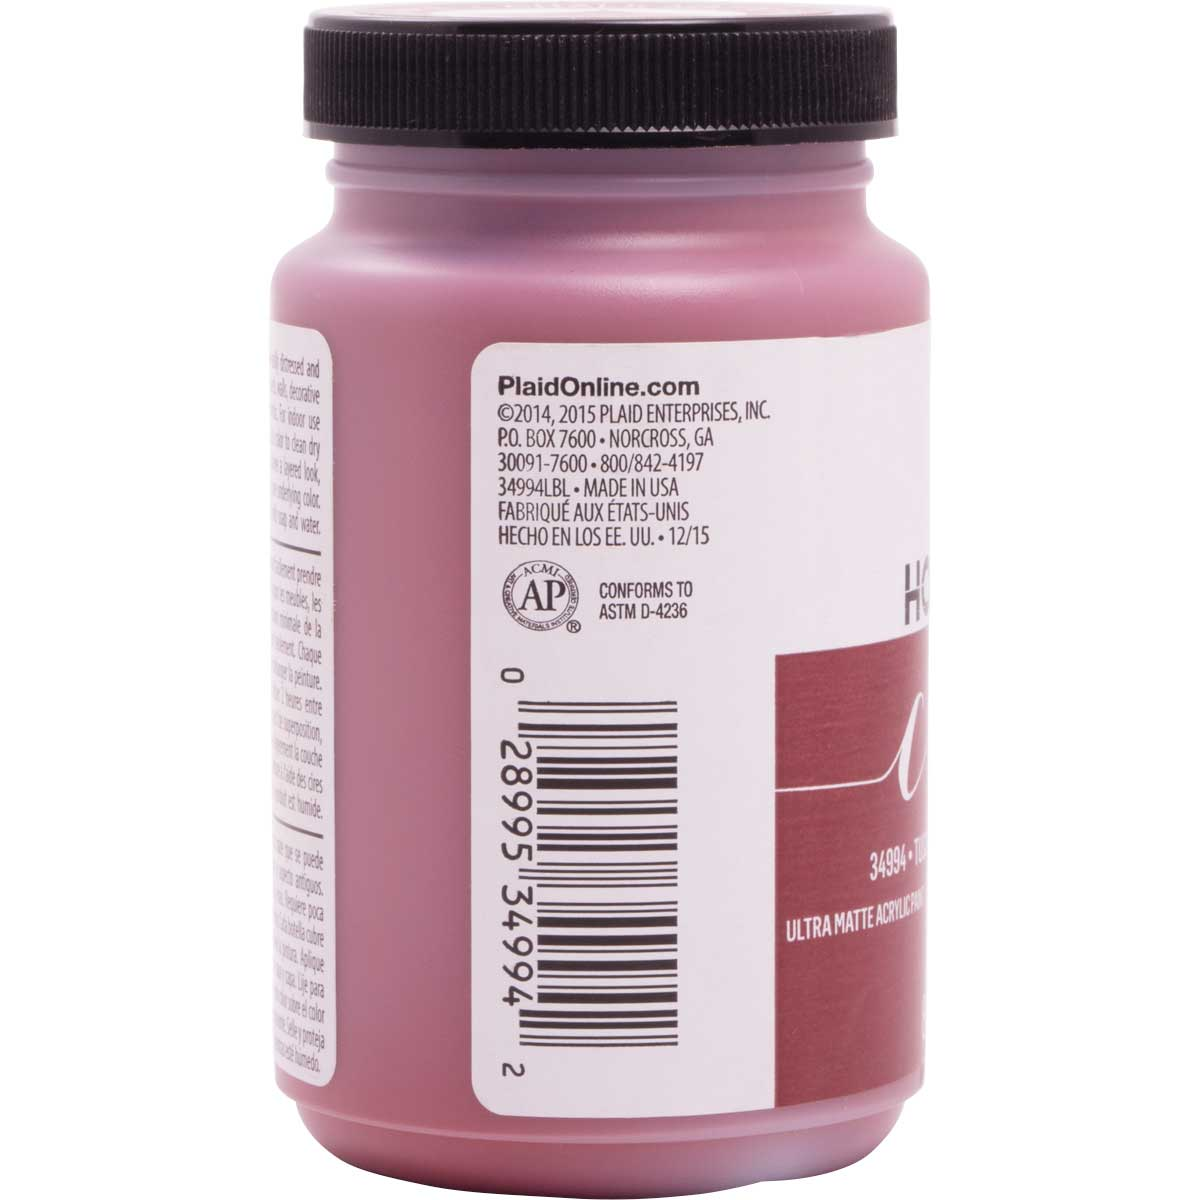 FolkArt ® Home Decor™ Chalk - Tuscan Red, 8 oz. - 34994